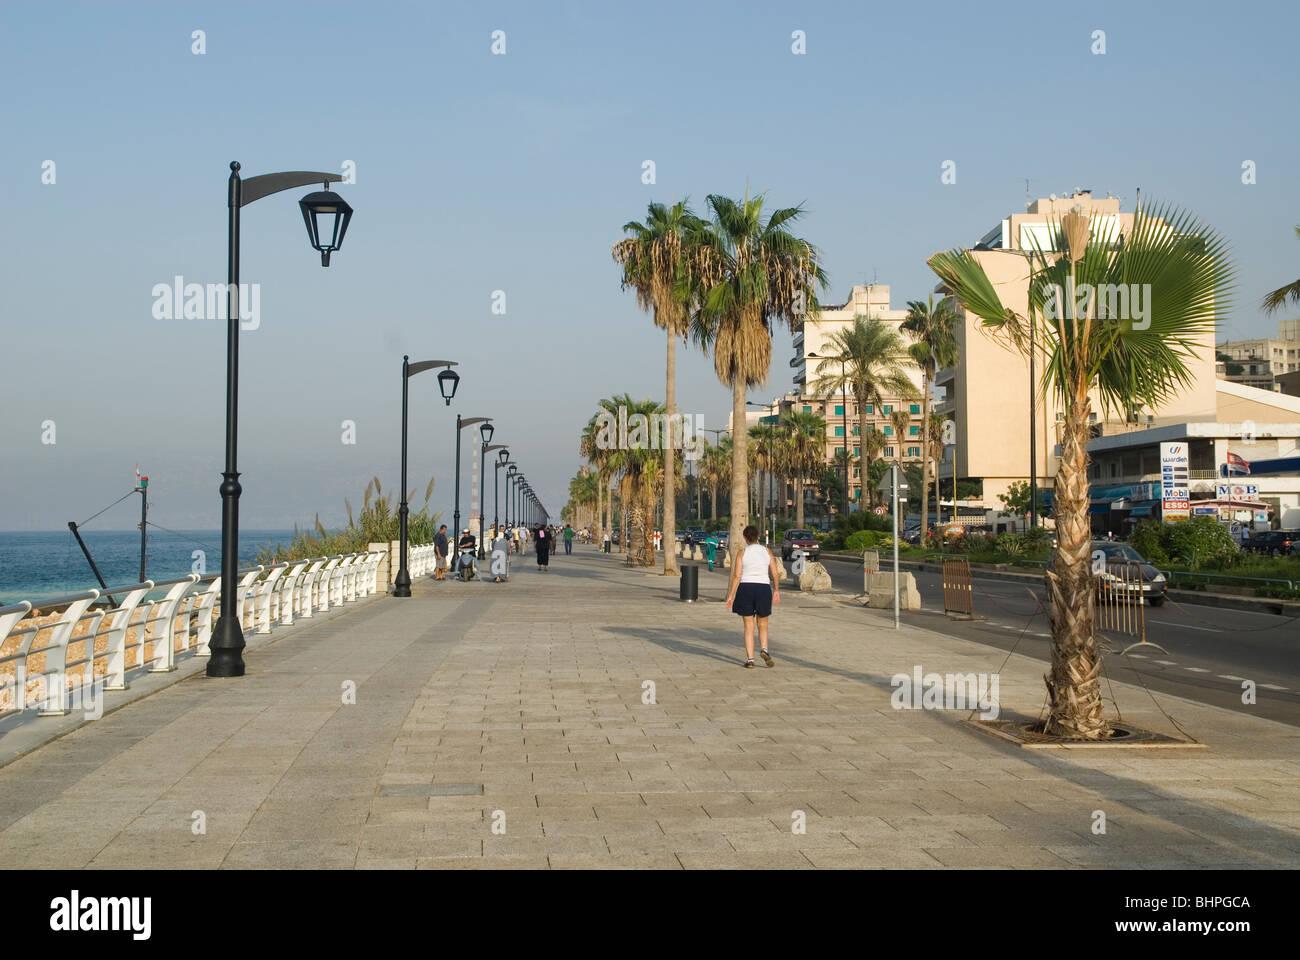 Promenade by the Mediterranean sea in Manara Beirut Lebanon Middle East Stock Photo